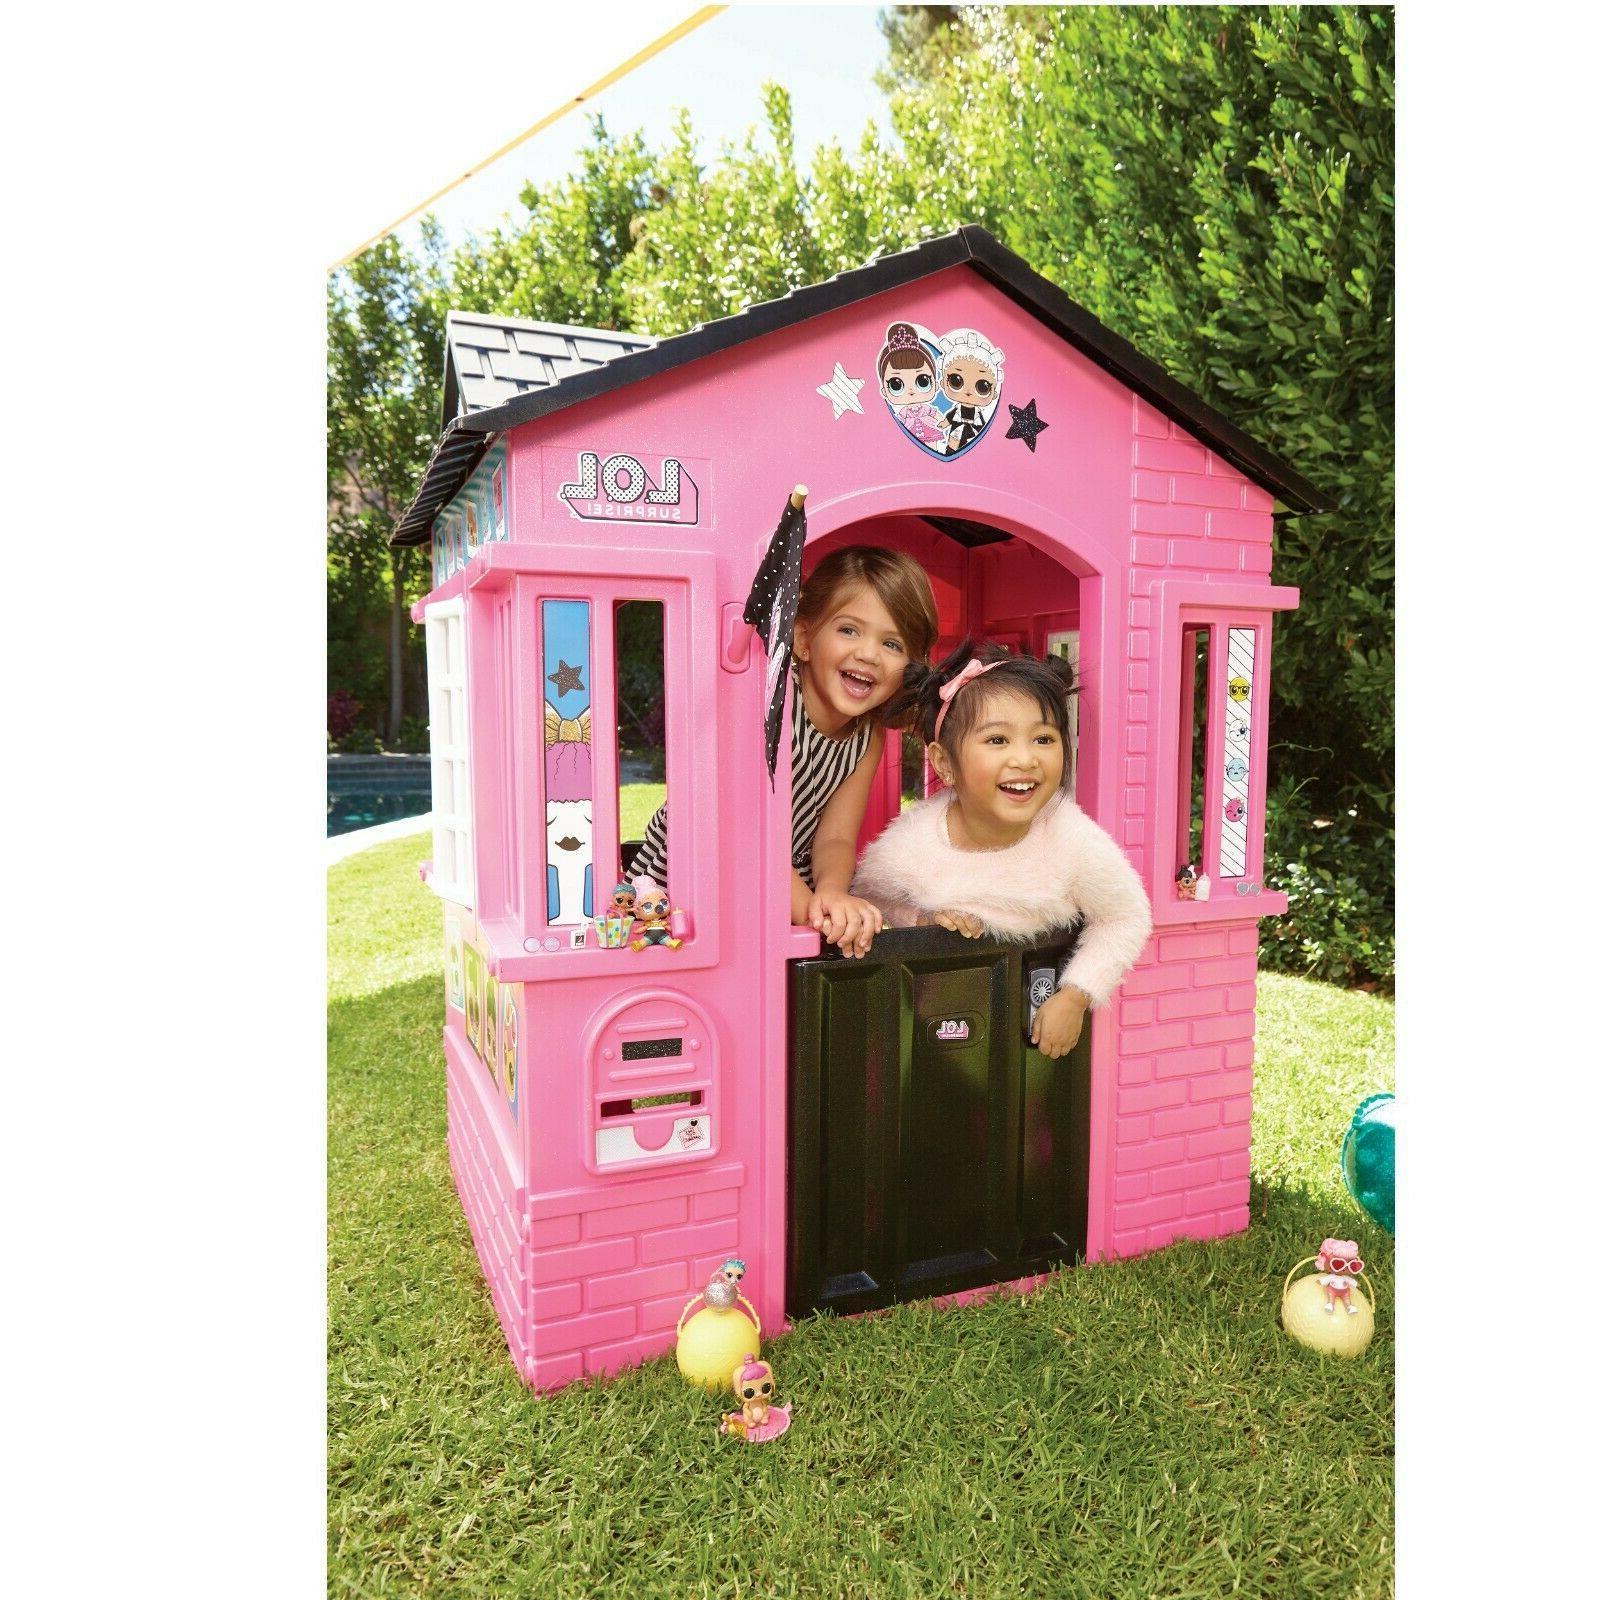 Plastic Play Toddler Indoor Fun Playhouse